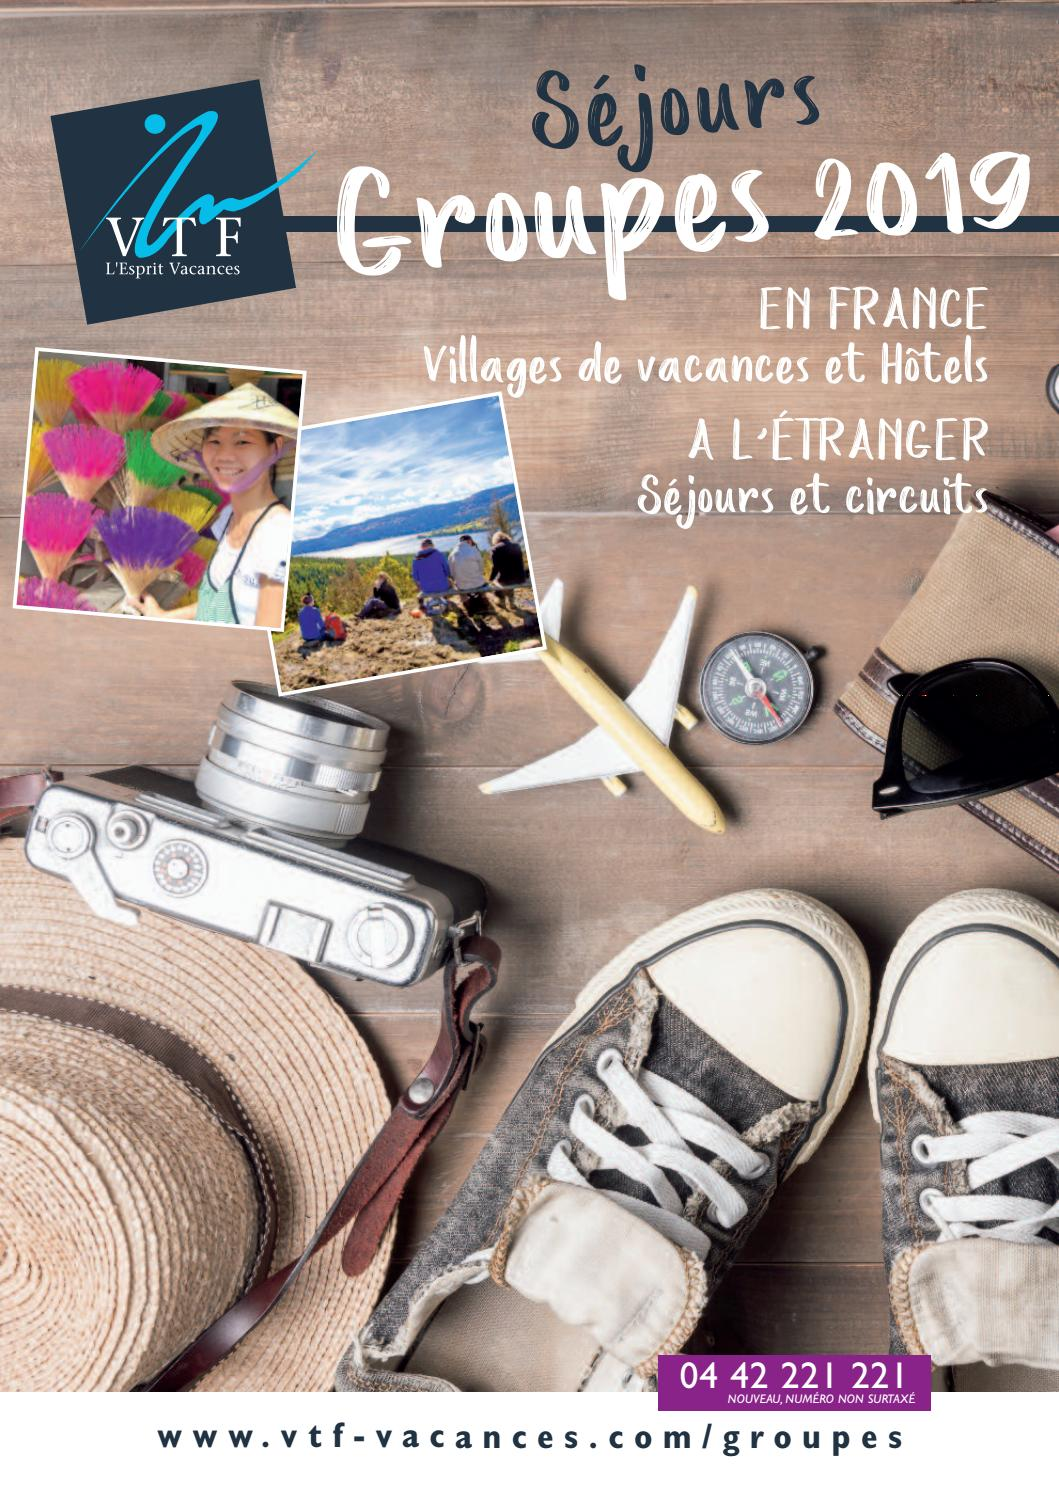 Vacances By Issuu Vtf Groupe L'esprit 2019 Brochure LSc3A5q4Rj